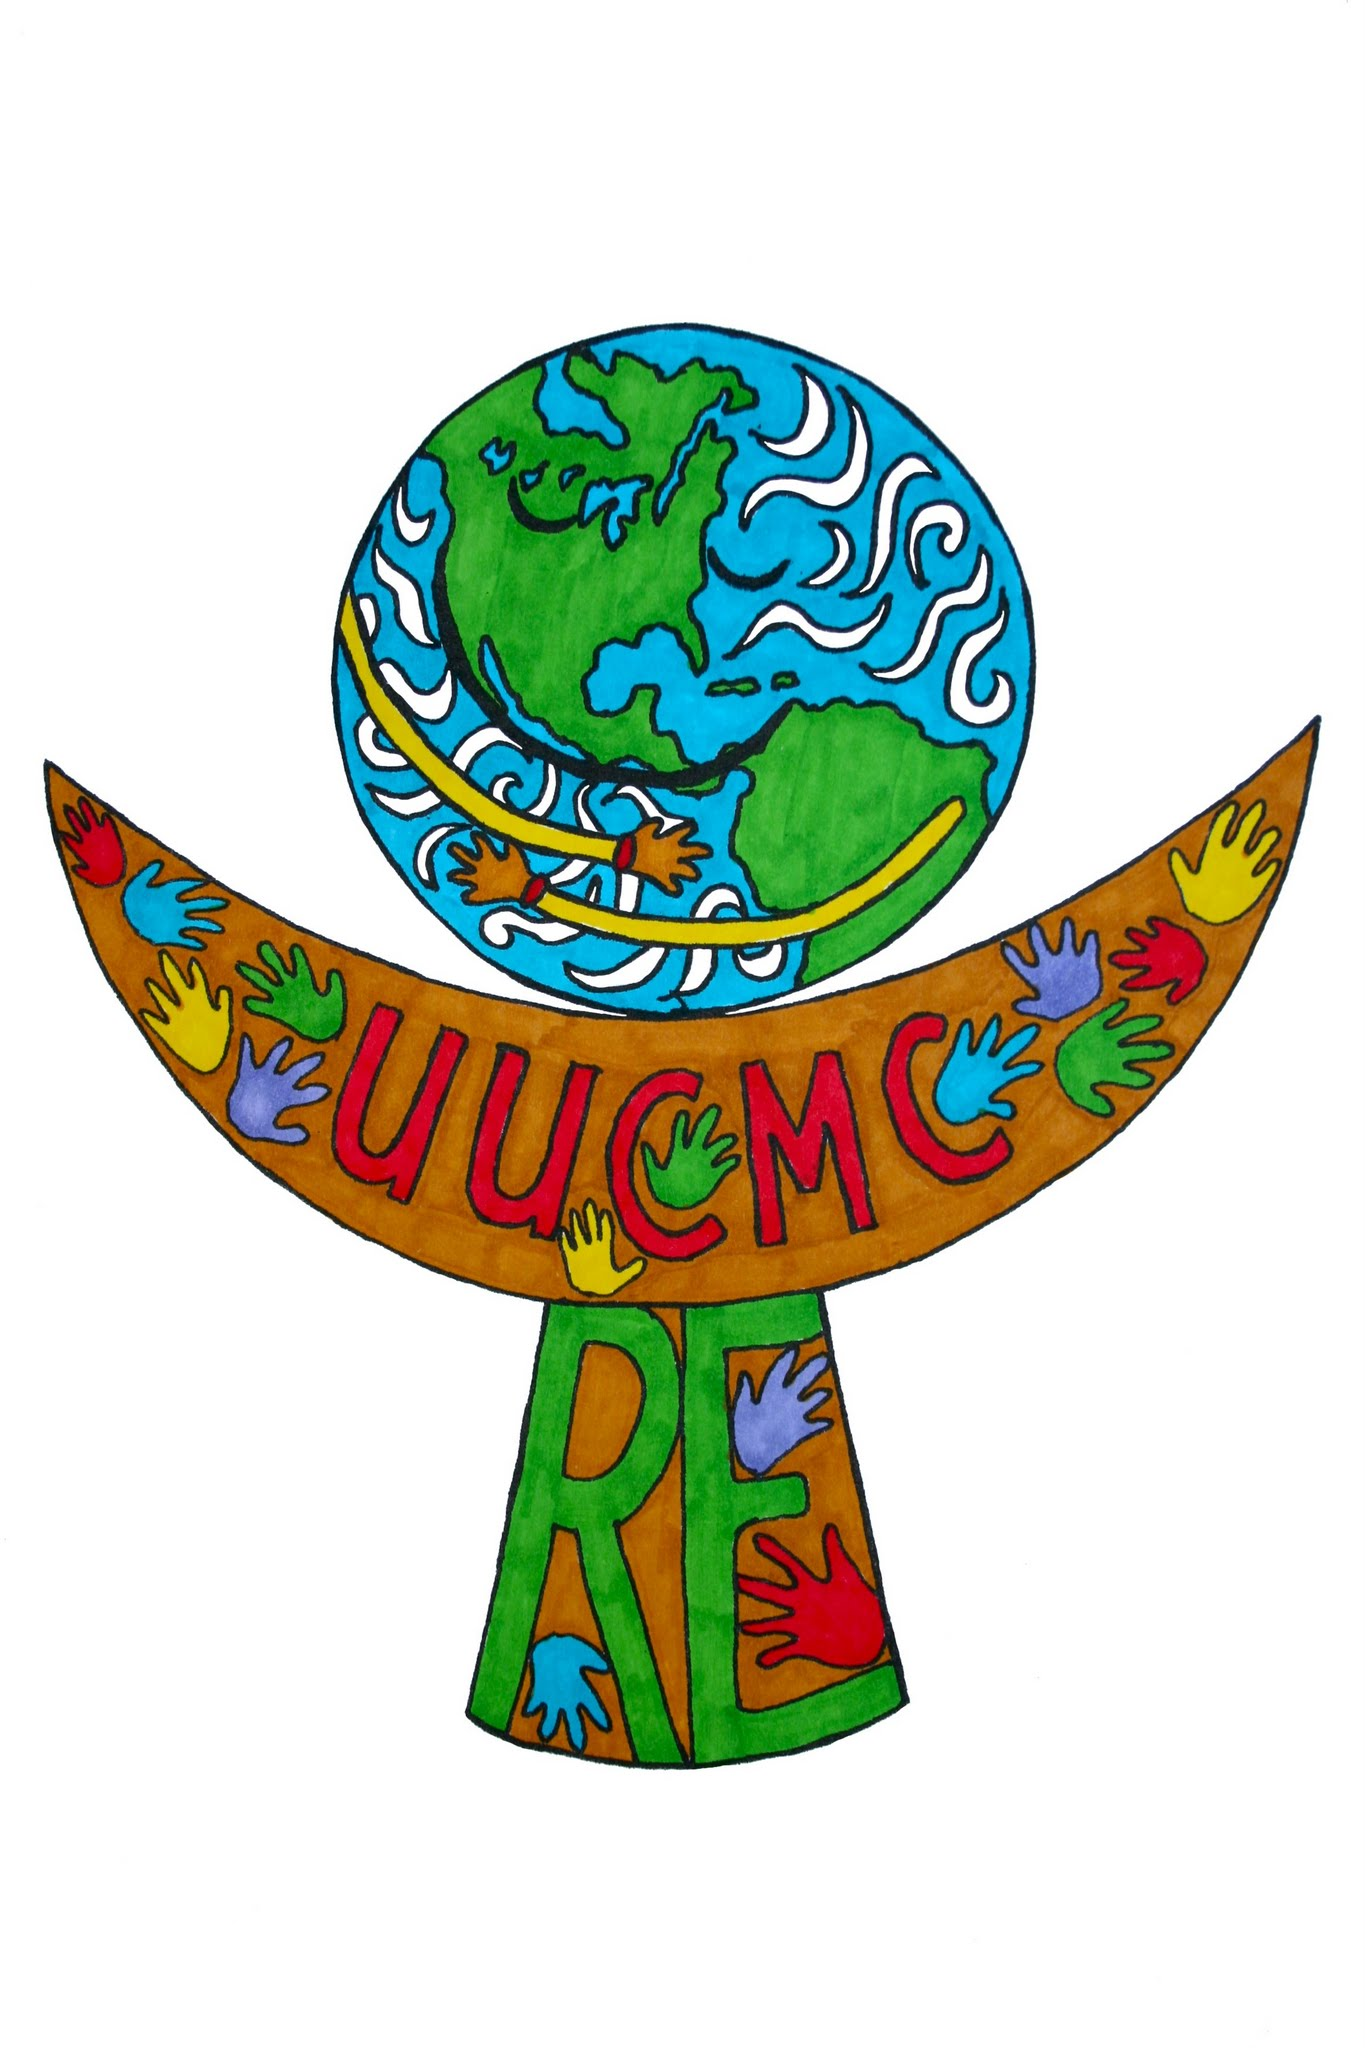 UUCMC RE Chalice